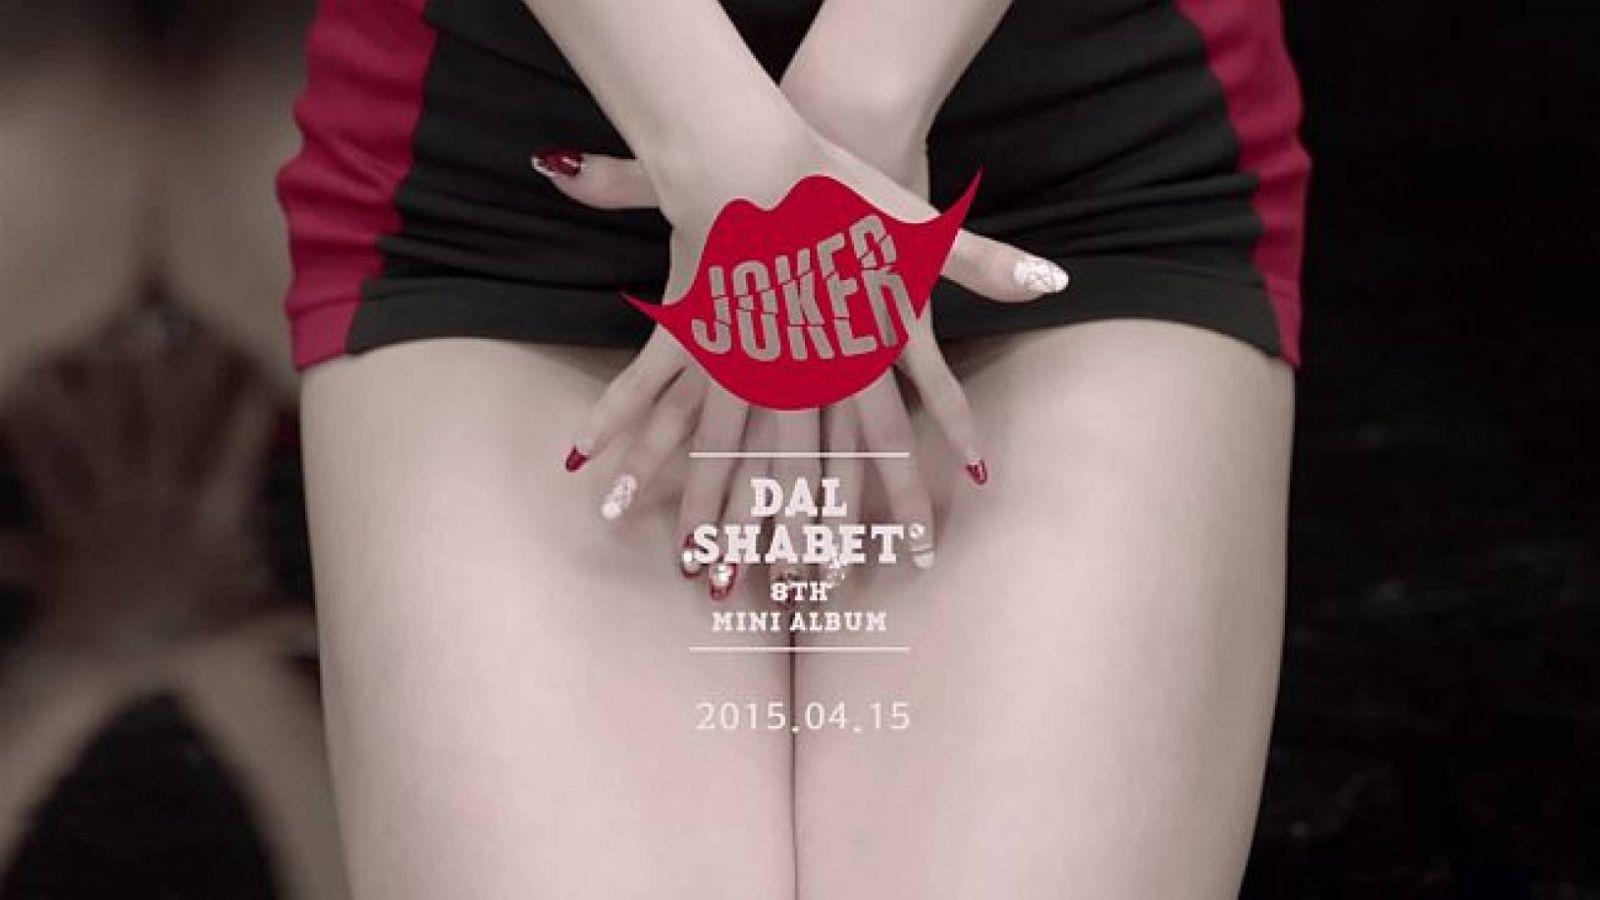 JOKER, o comeback de Dal Shabet © Dalshabet Official Facebook Page